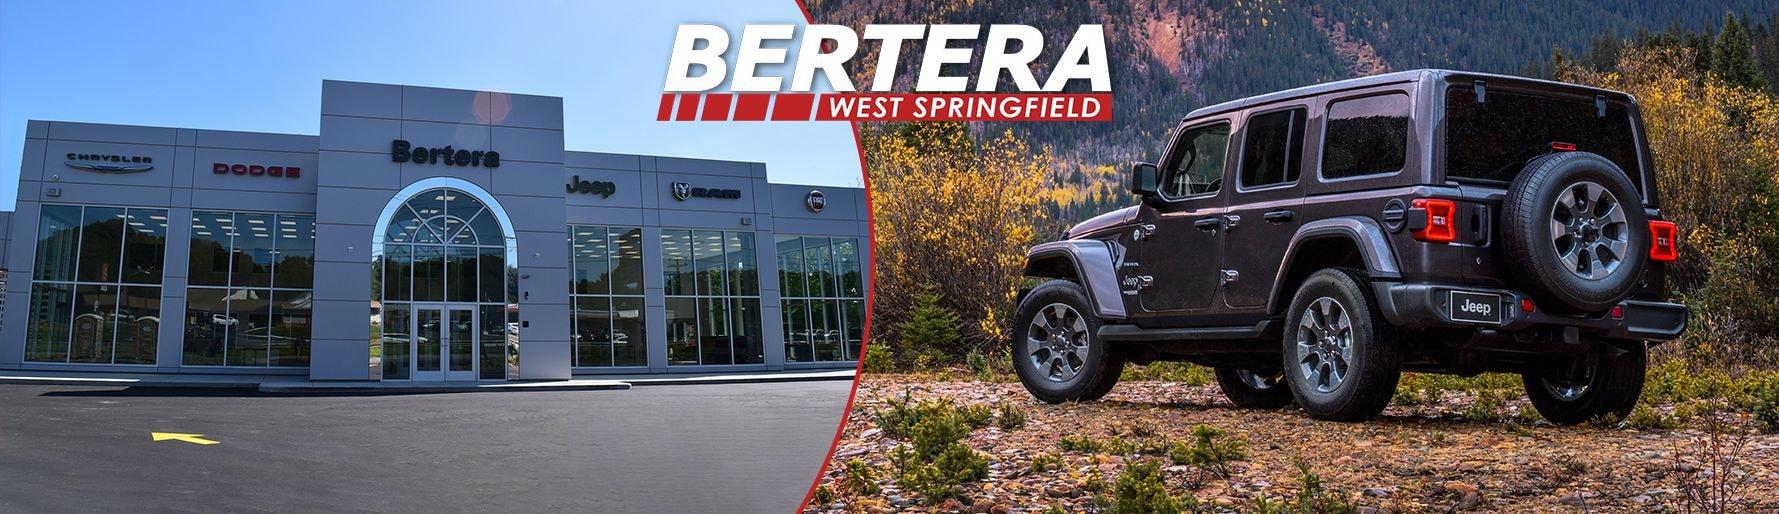 Bertera Subaru West Springfield >> Bertera Auto Dealer Group | Over 40 Years of Serving New ...